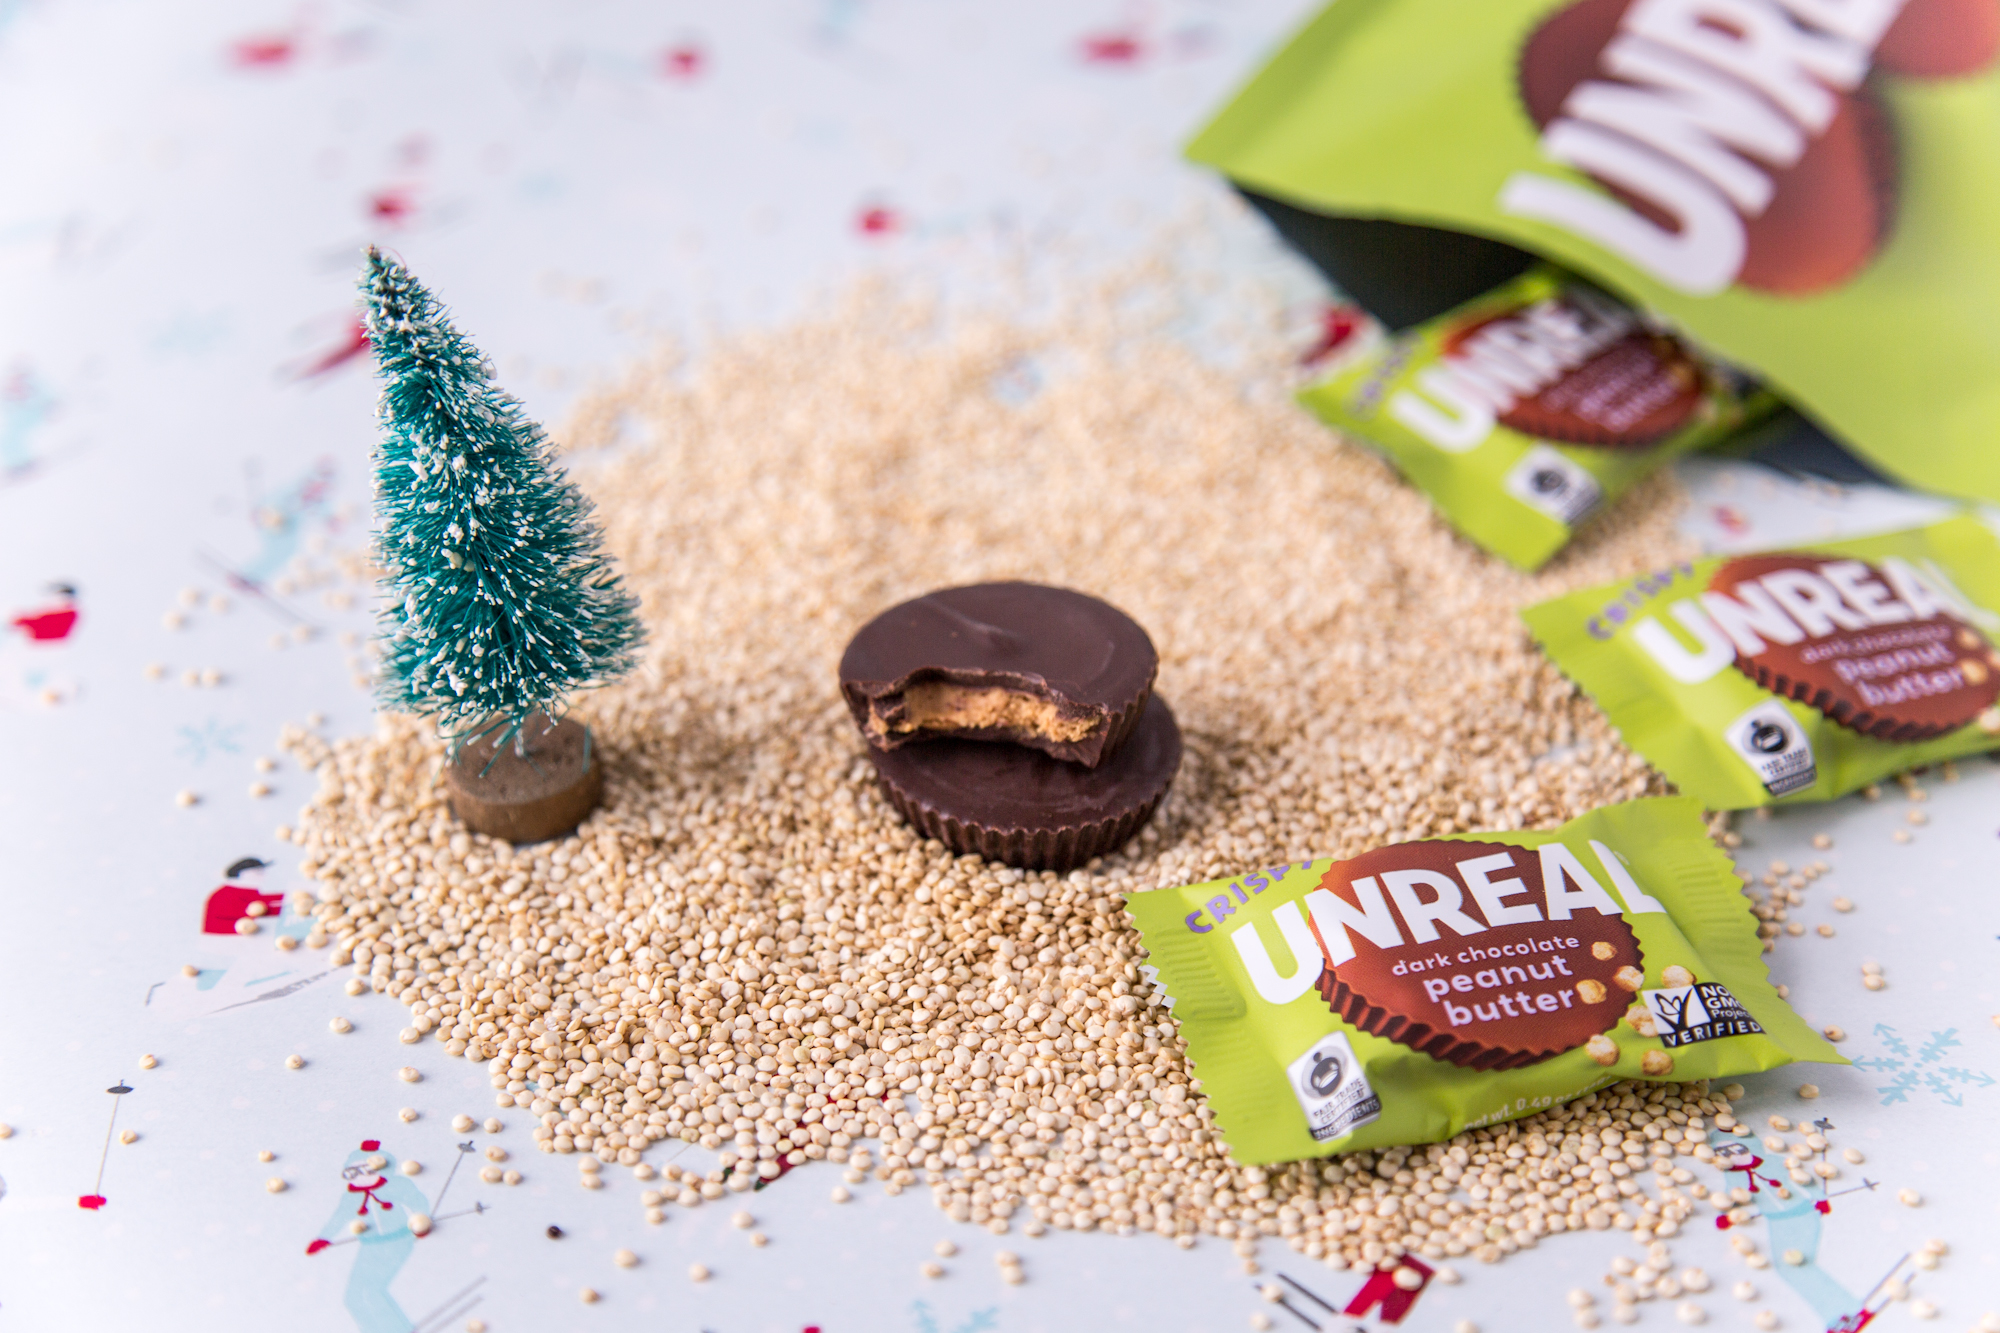 Snacking in a quinoa wonderland   Product: Unreal Crispy Quinoa Dark Chocolate Peanut Butter Cup